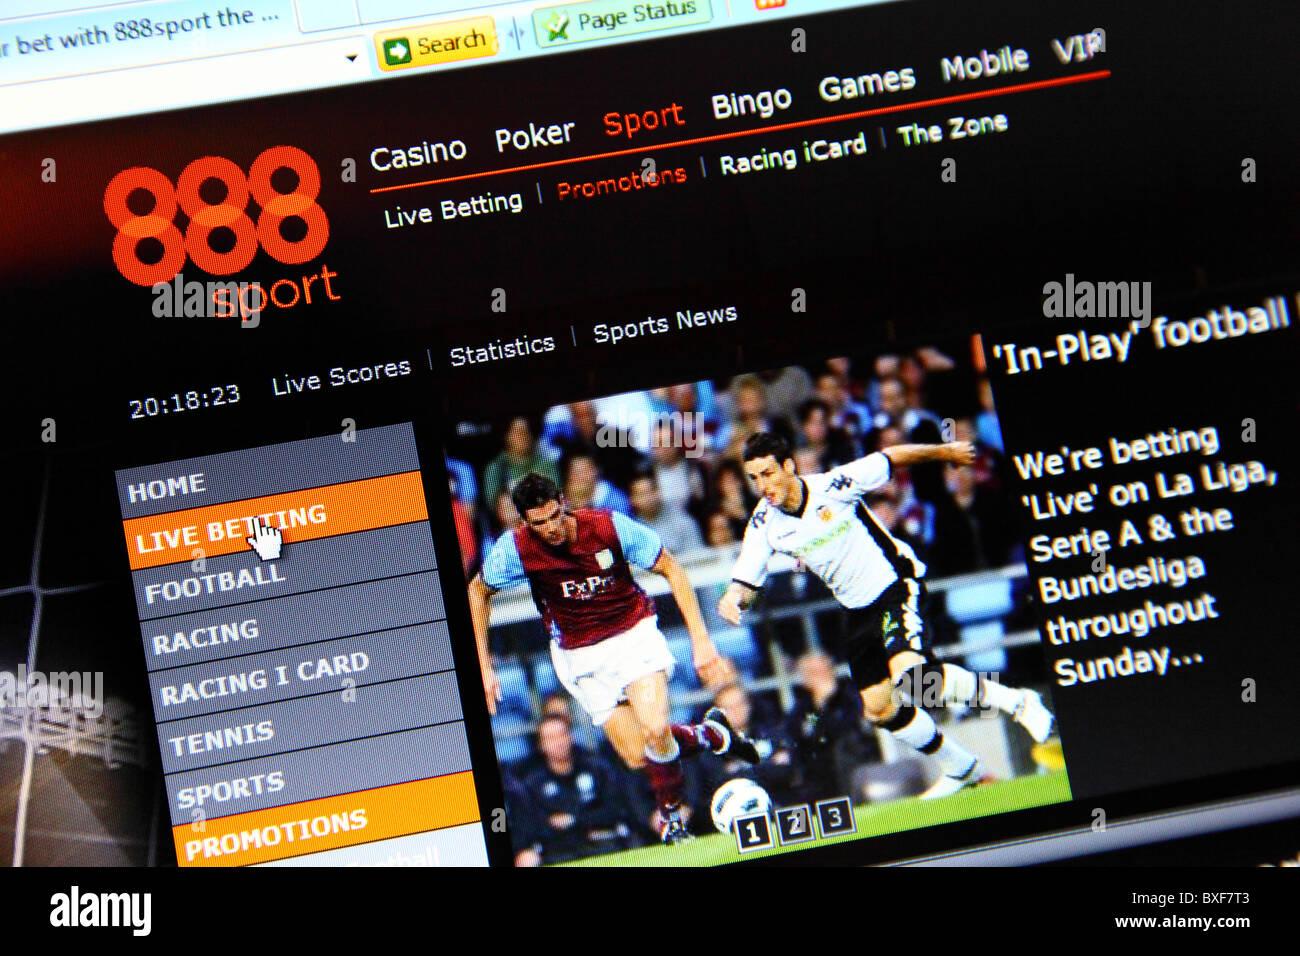 888.com online betting website. - Stock Image